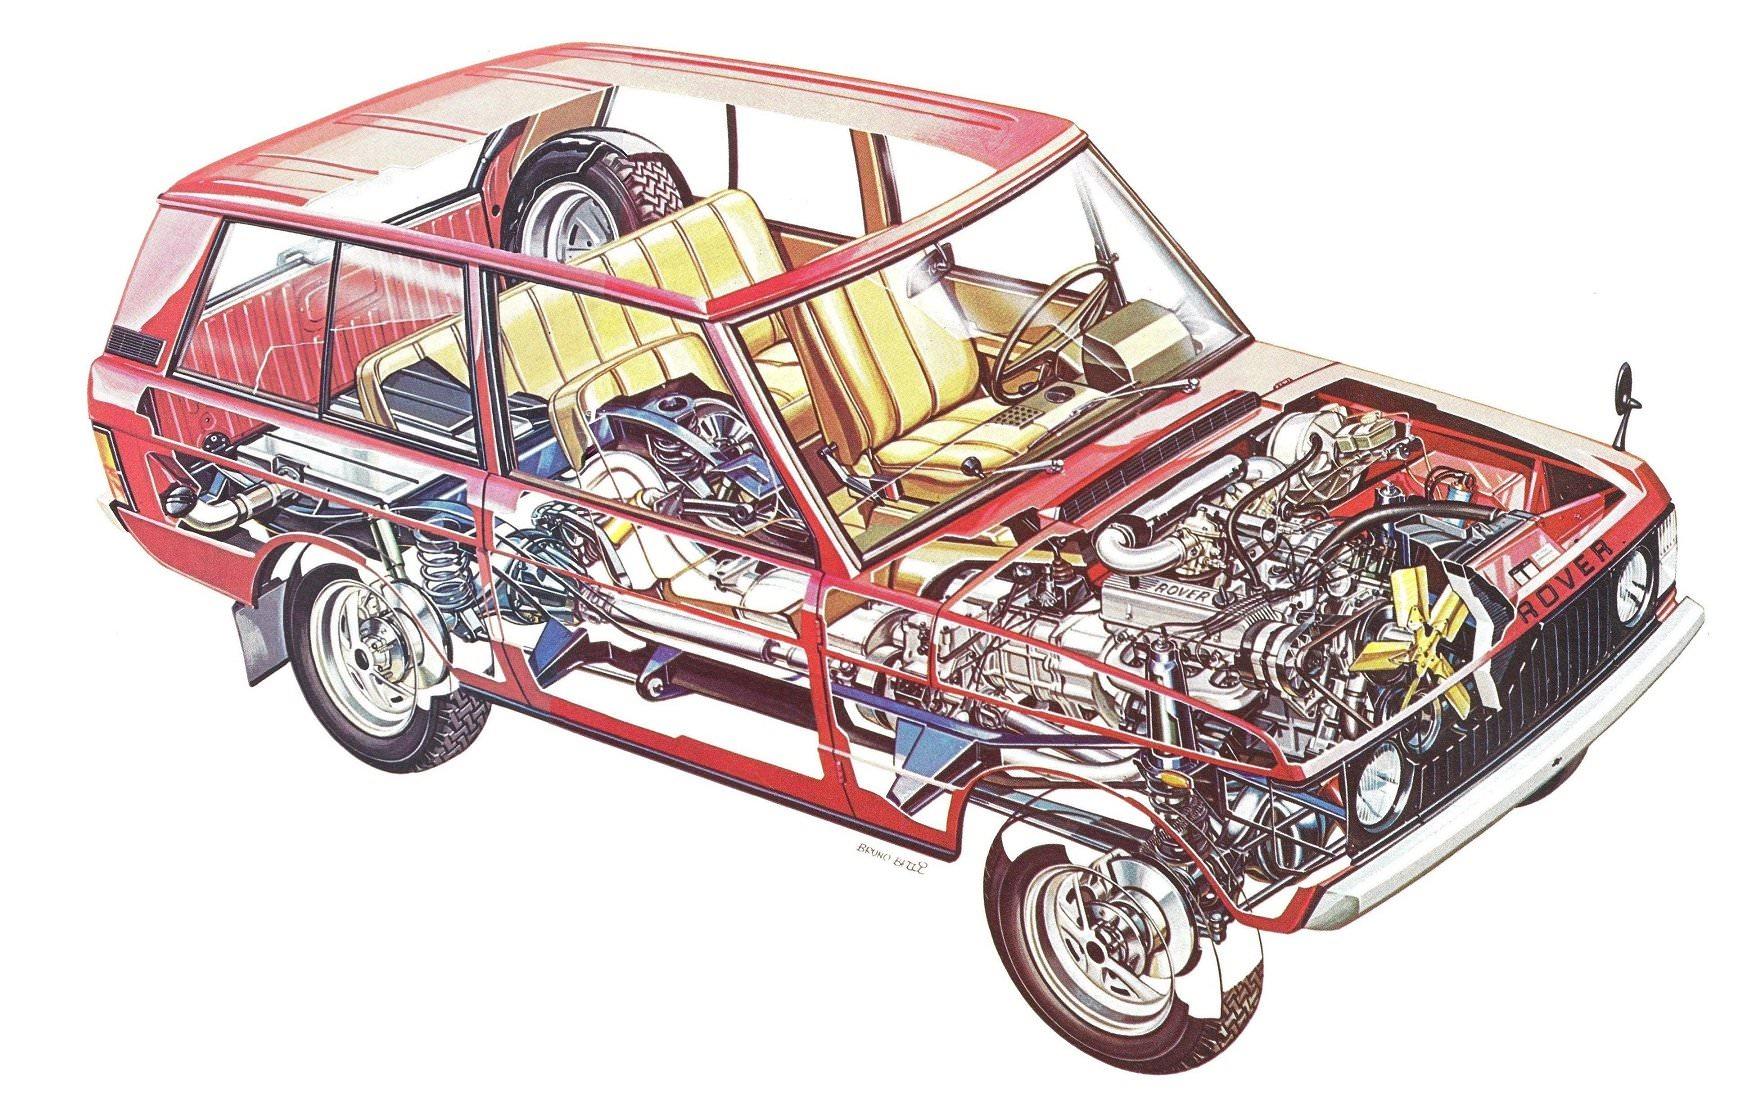 range rover classic engine overhaul manual